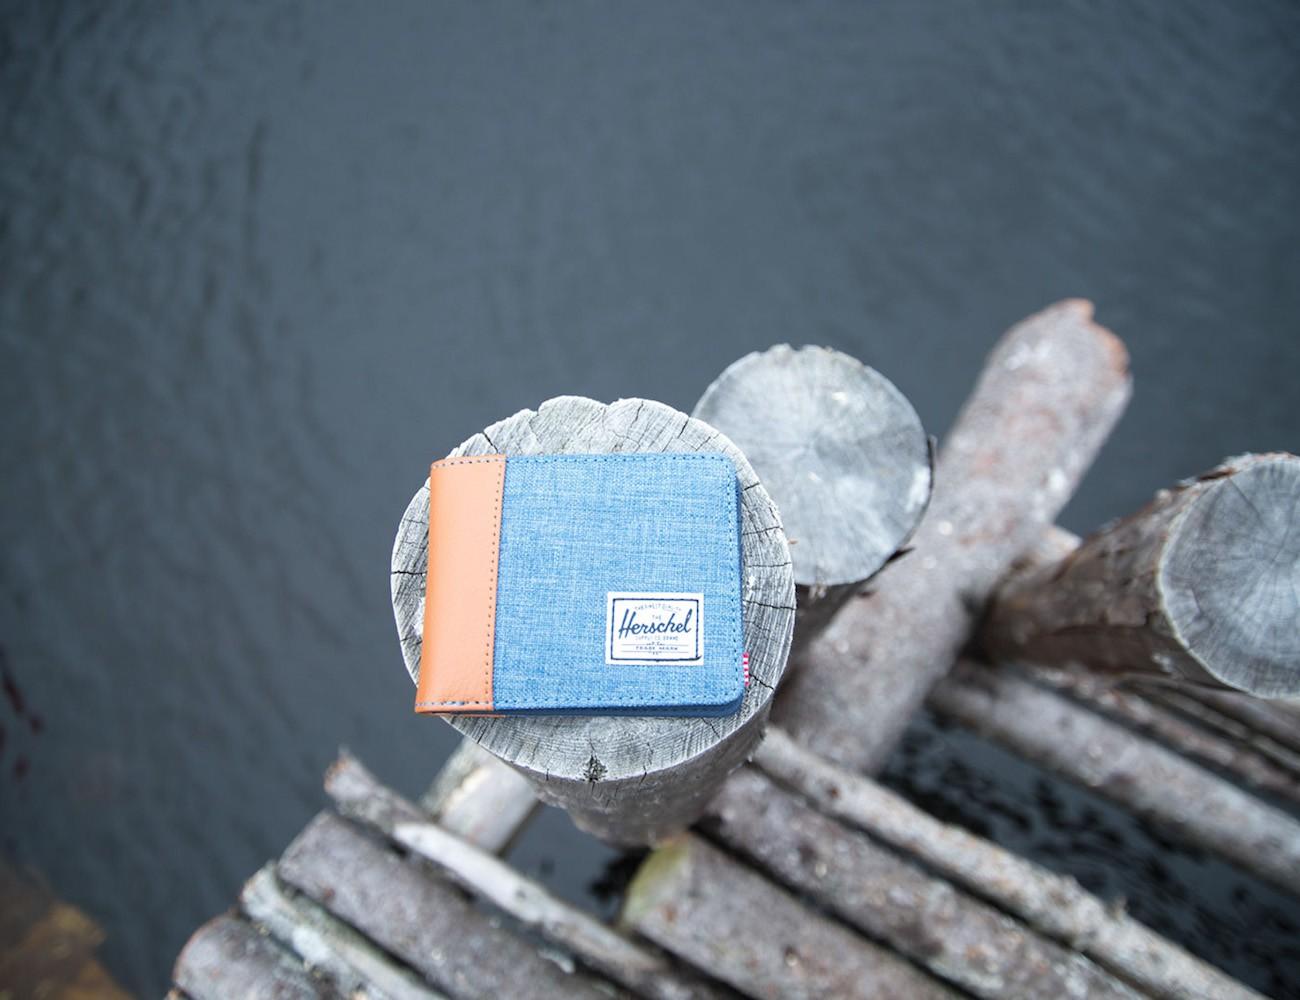 Edward+Crosshatch+Wallet+By+Herschel+Supply+Co